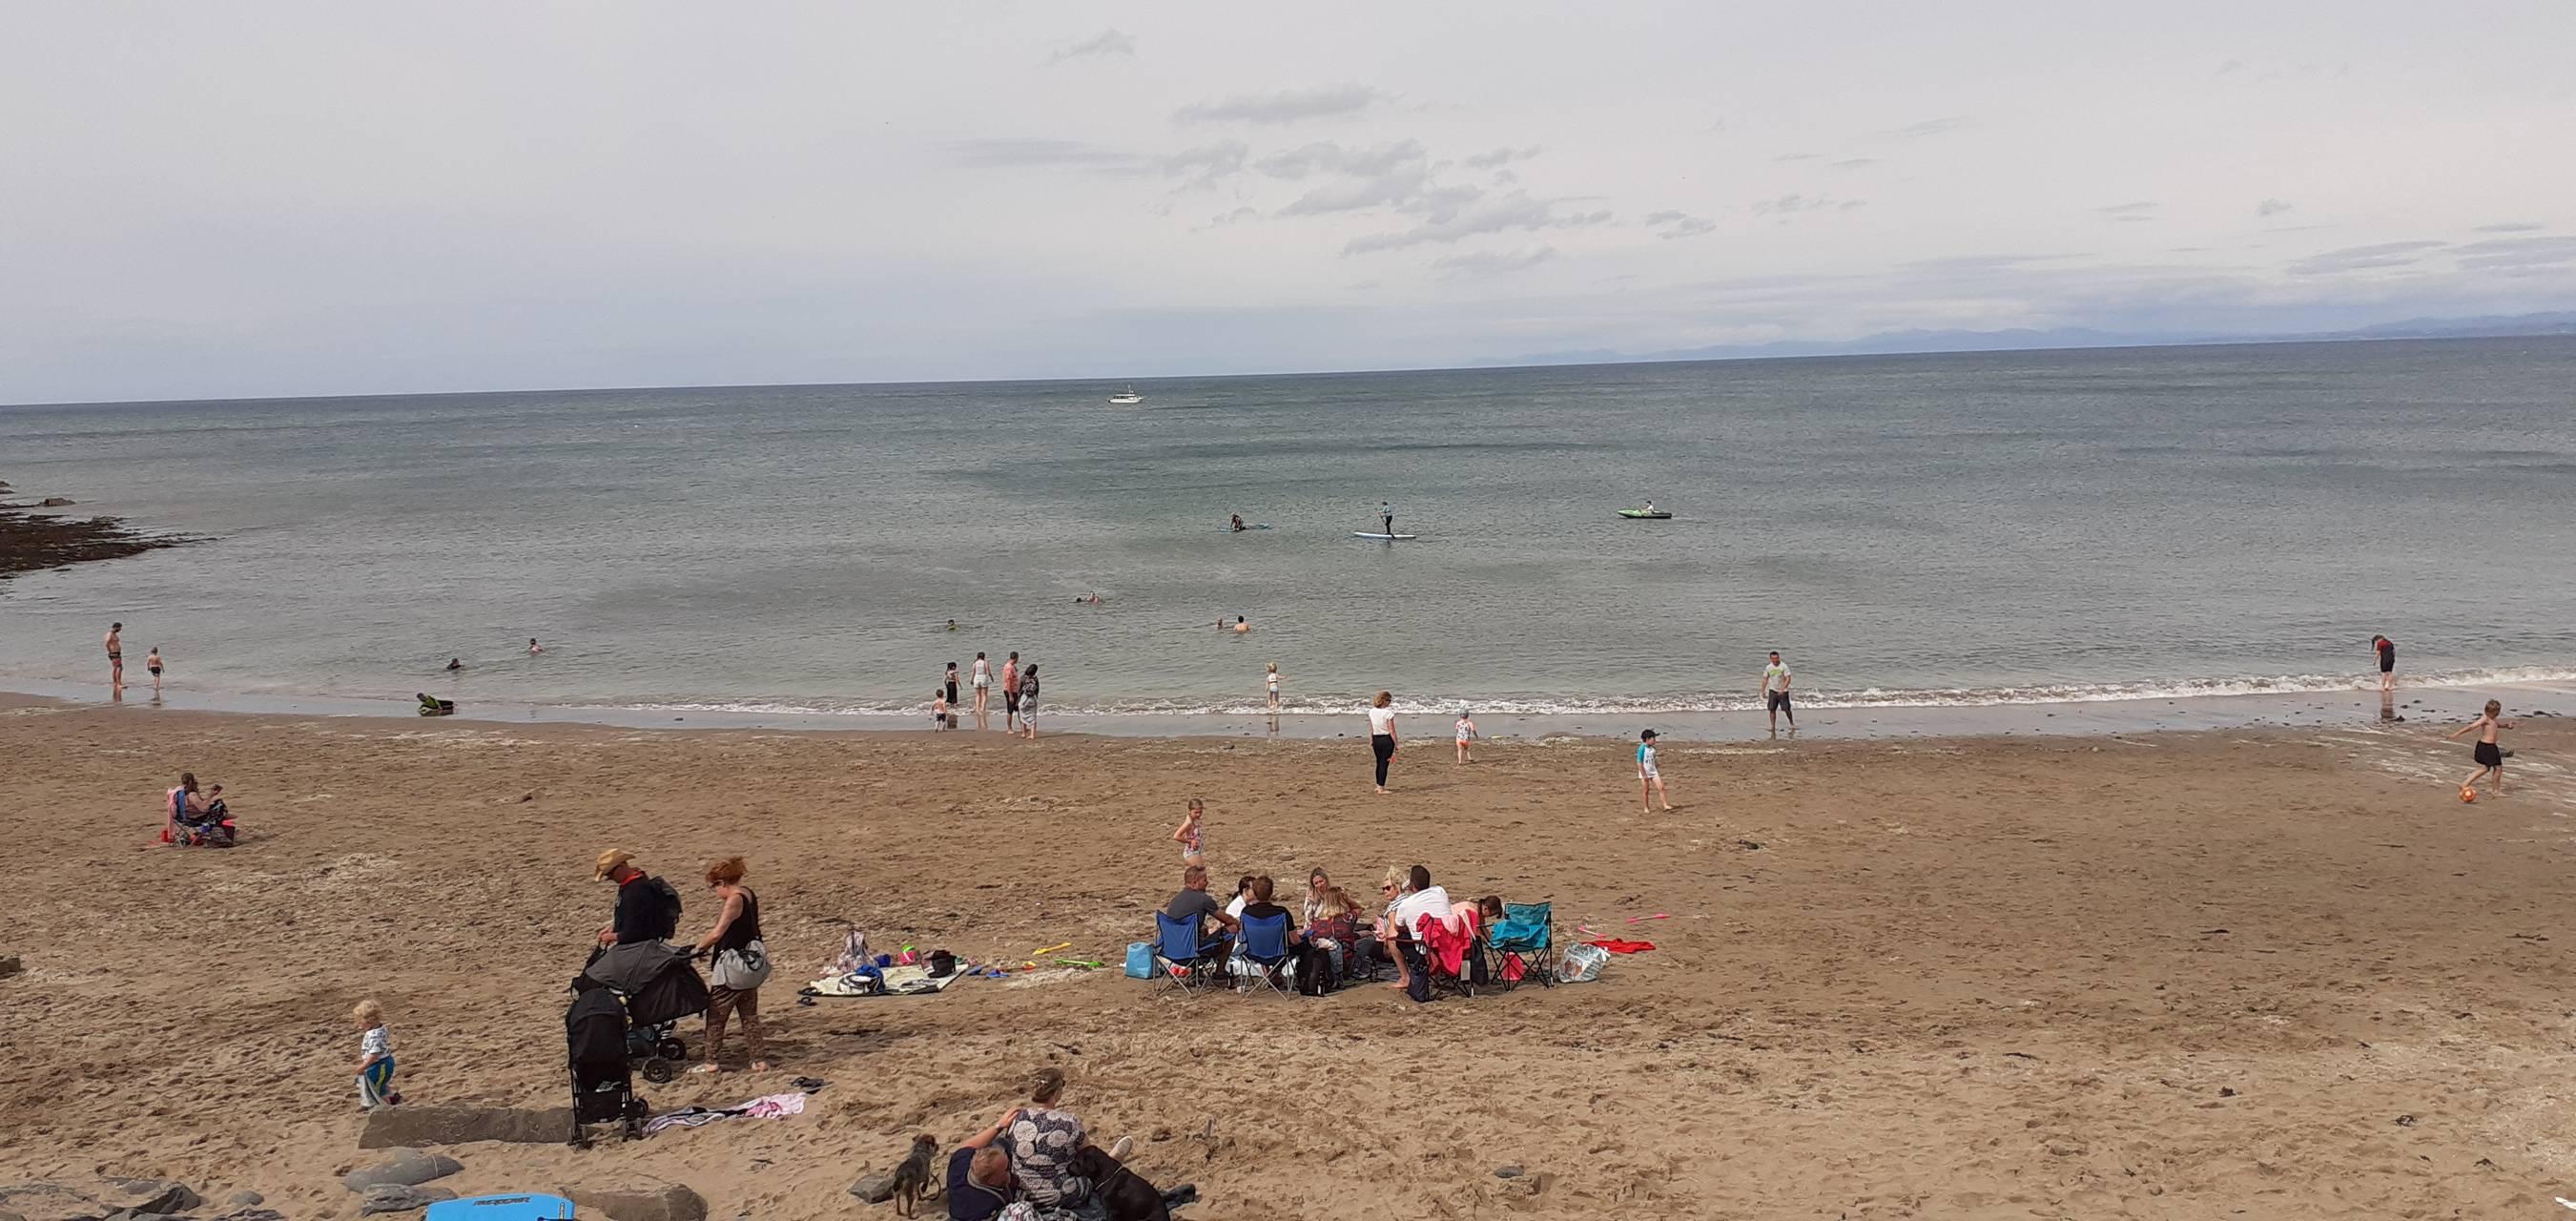 Newquay Seaside 2